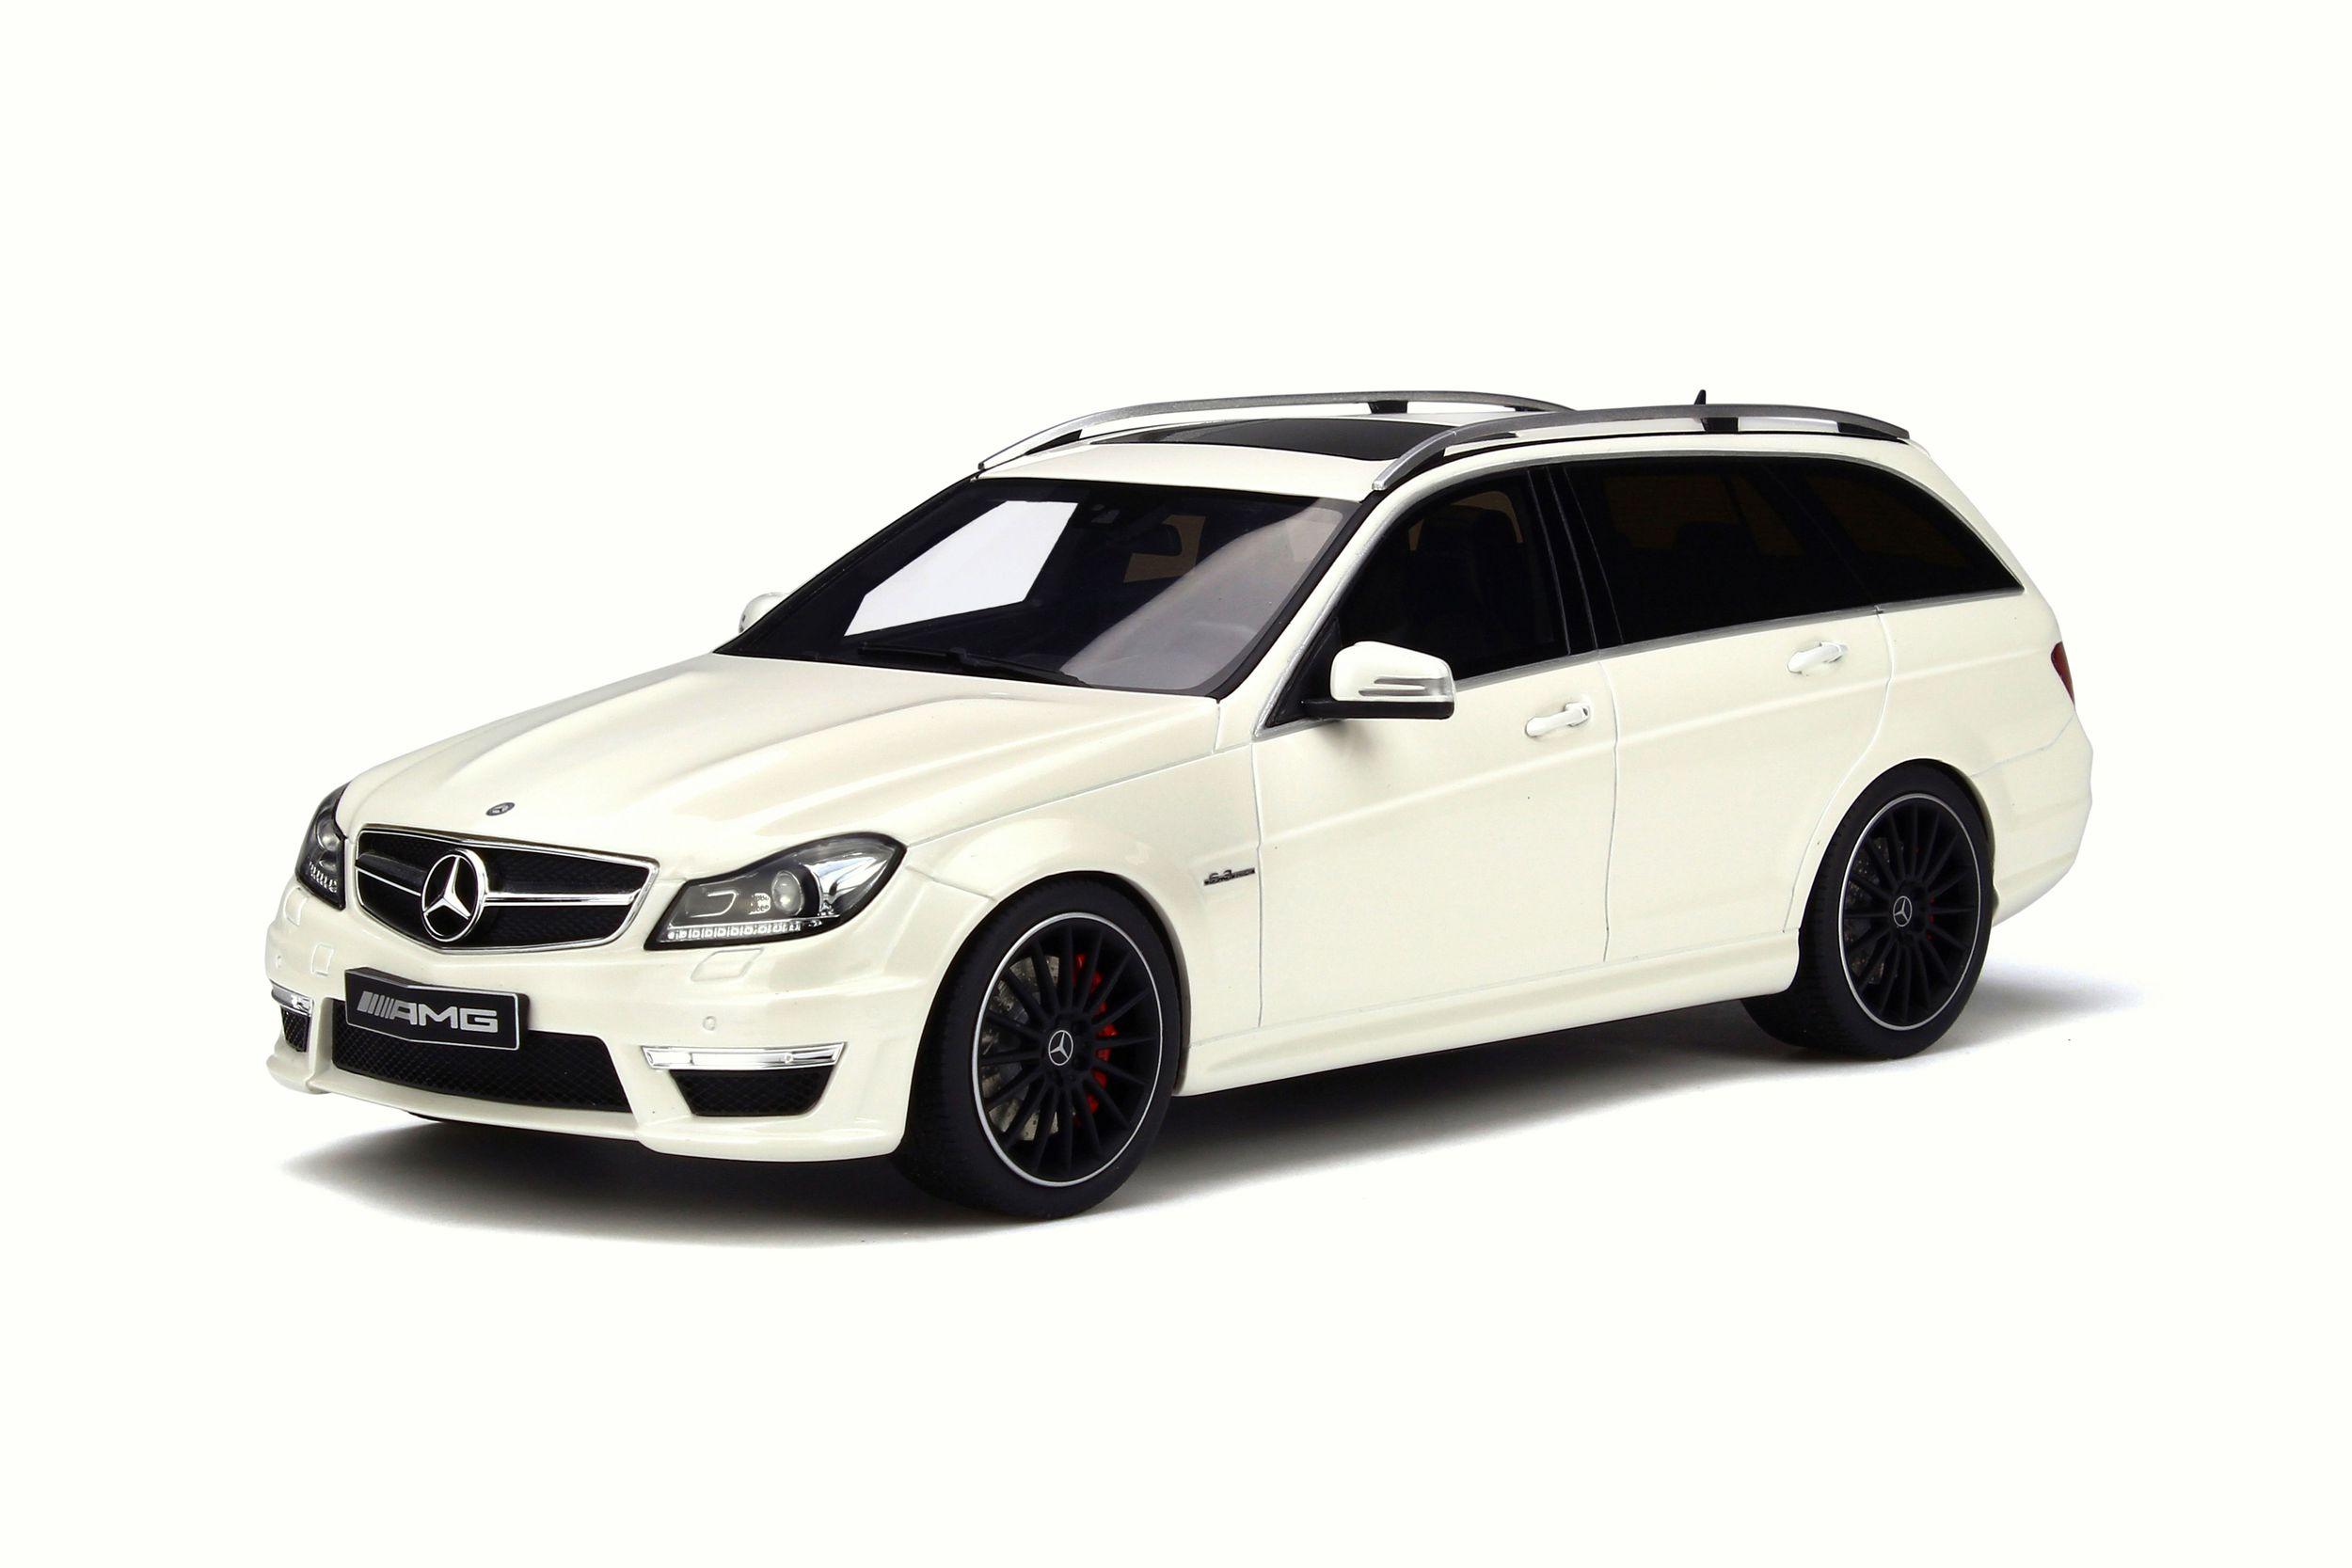 Mercedes Benz C63 AMG T Modell